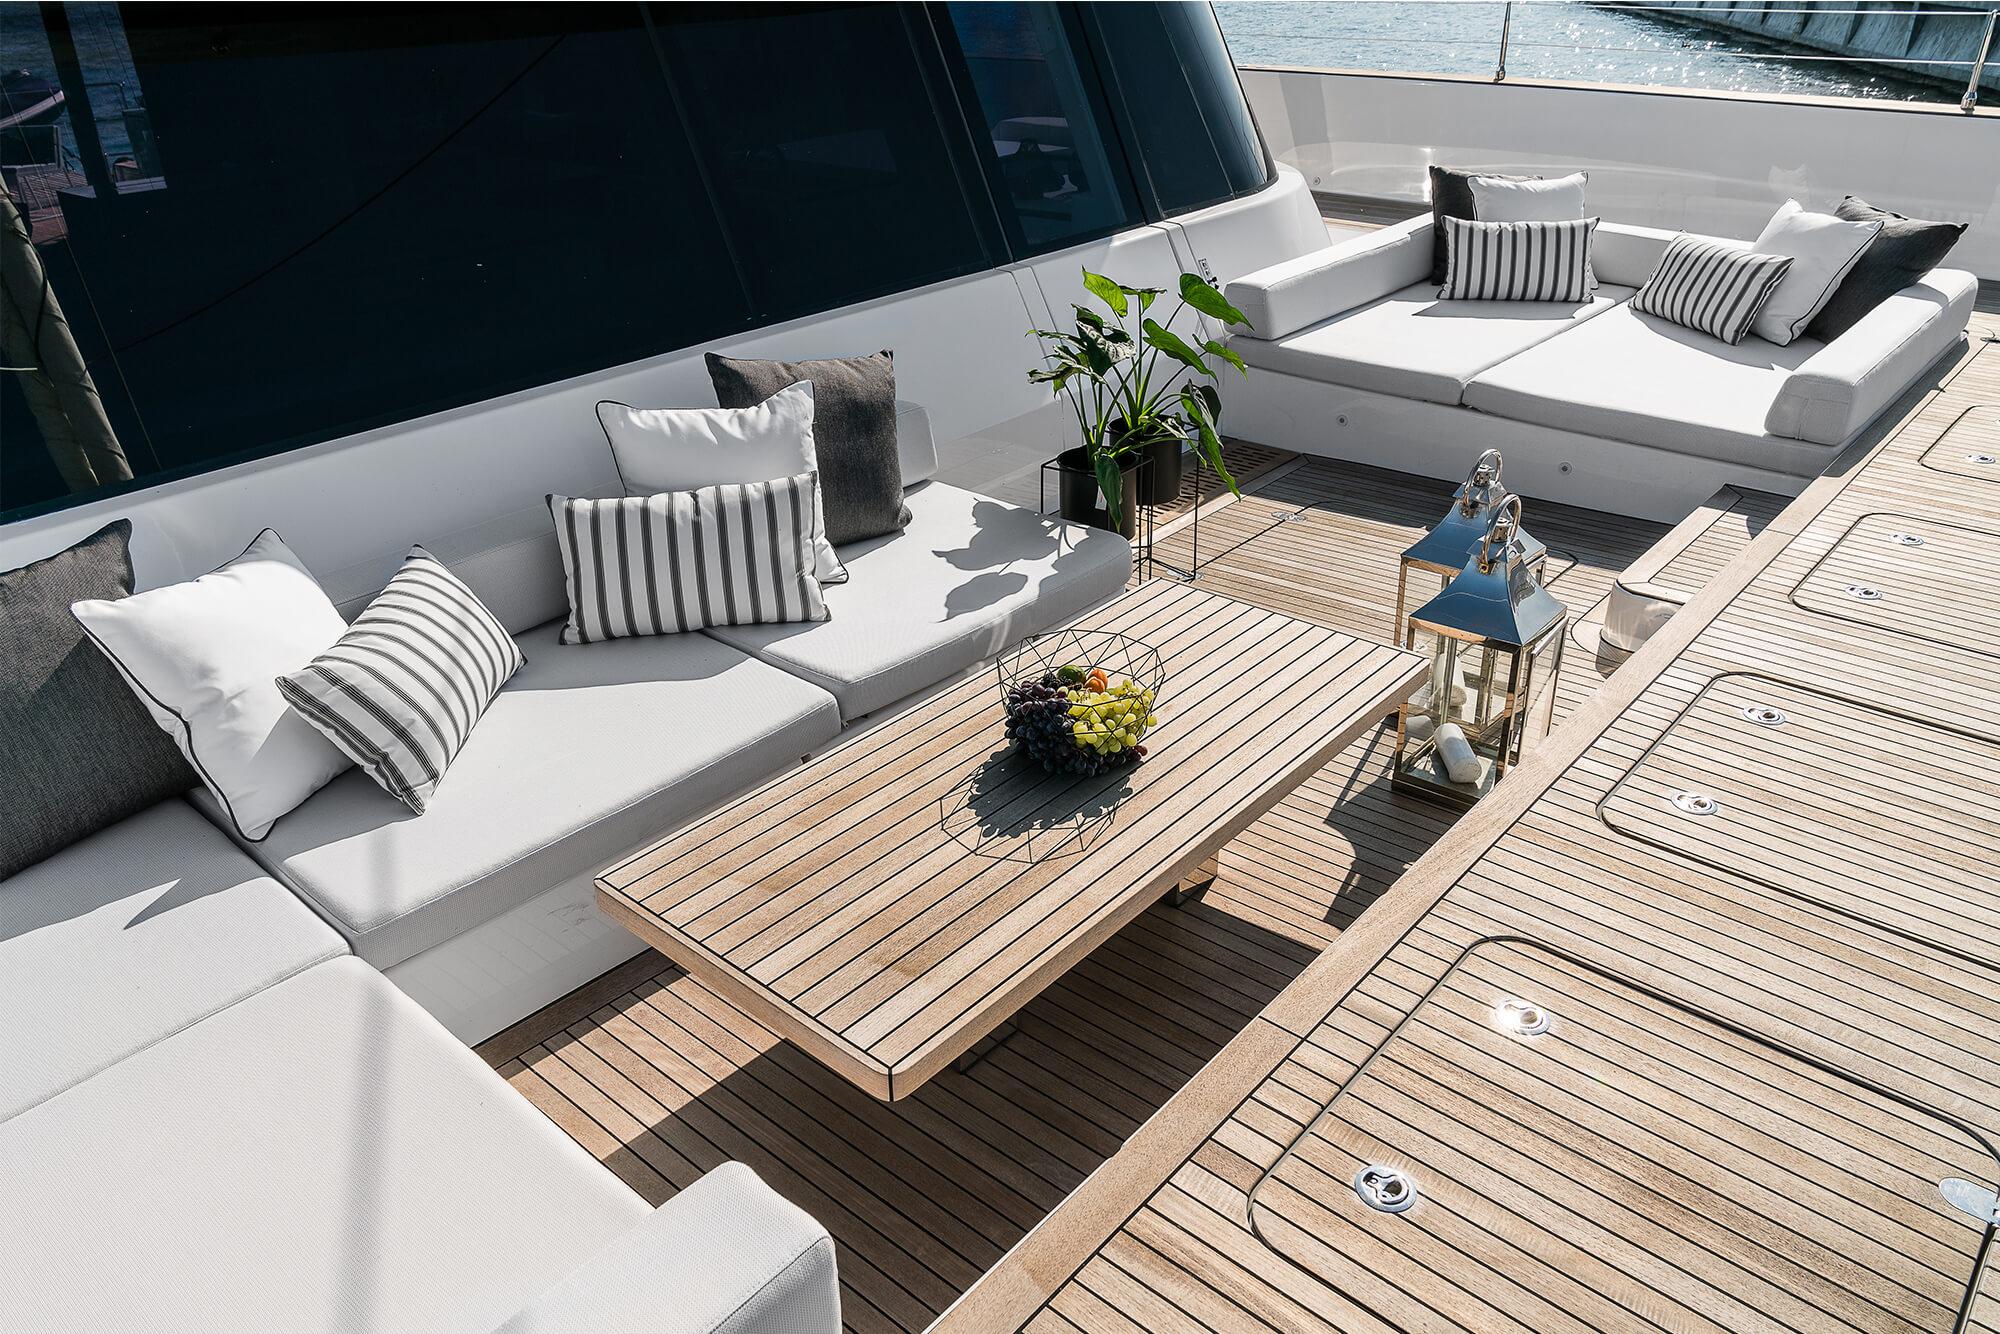 ABOVE Sunreef Catamaran 4